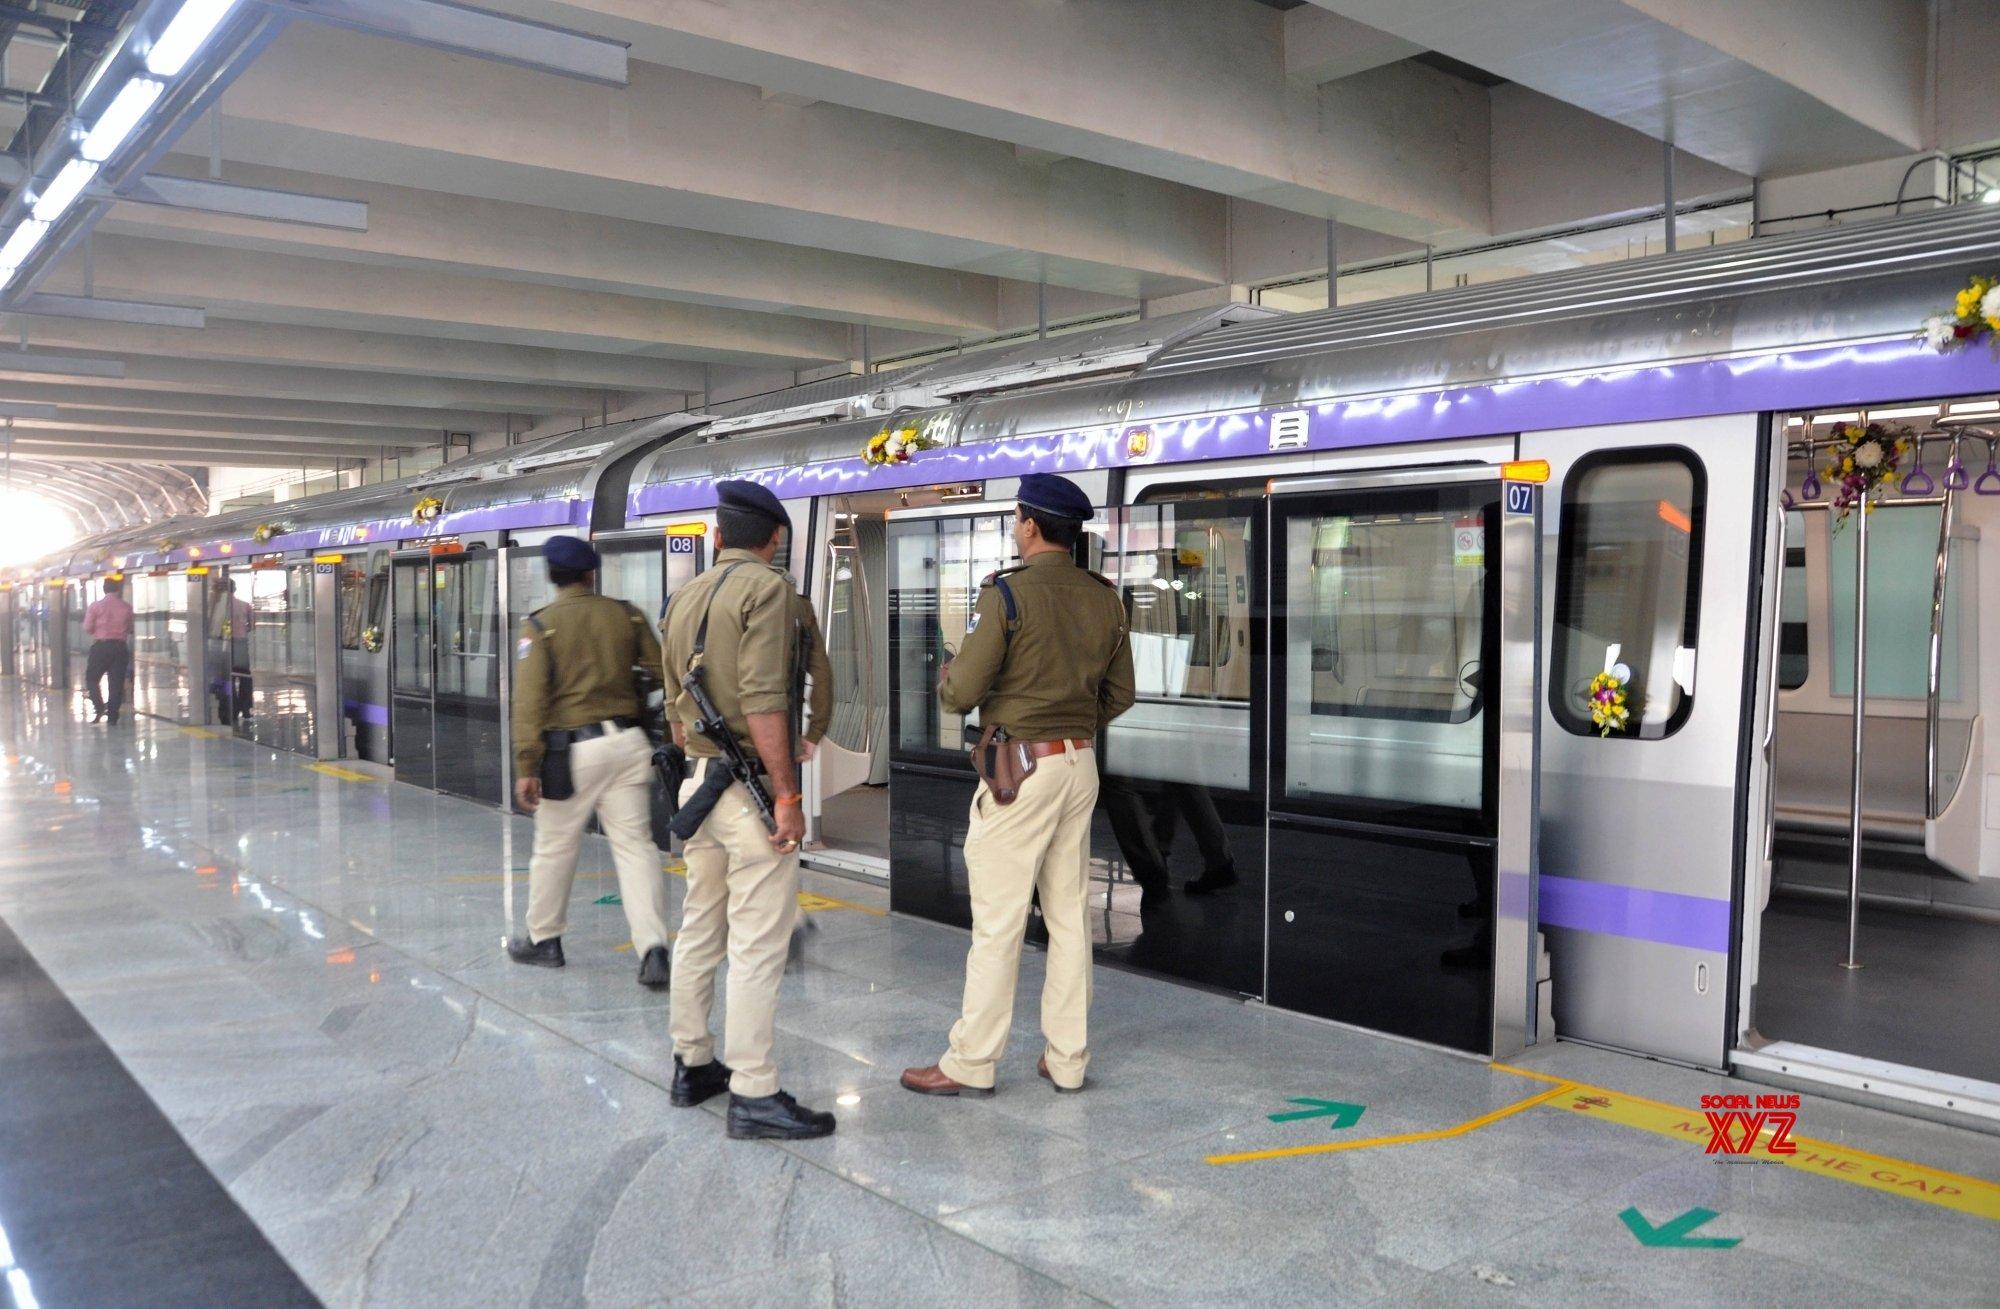 Kolkata: East - West metro line inauguration (Batch - 1) #Gallery - Social News XYZ